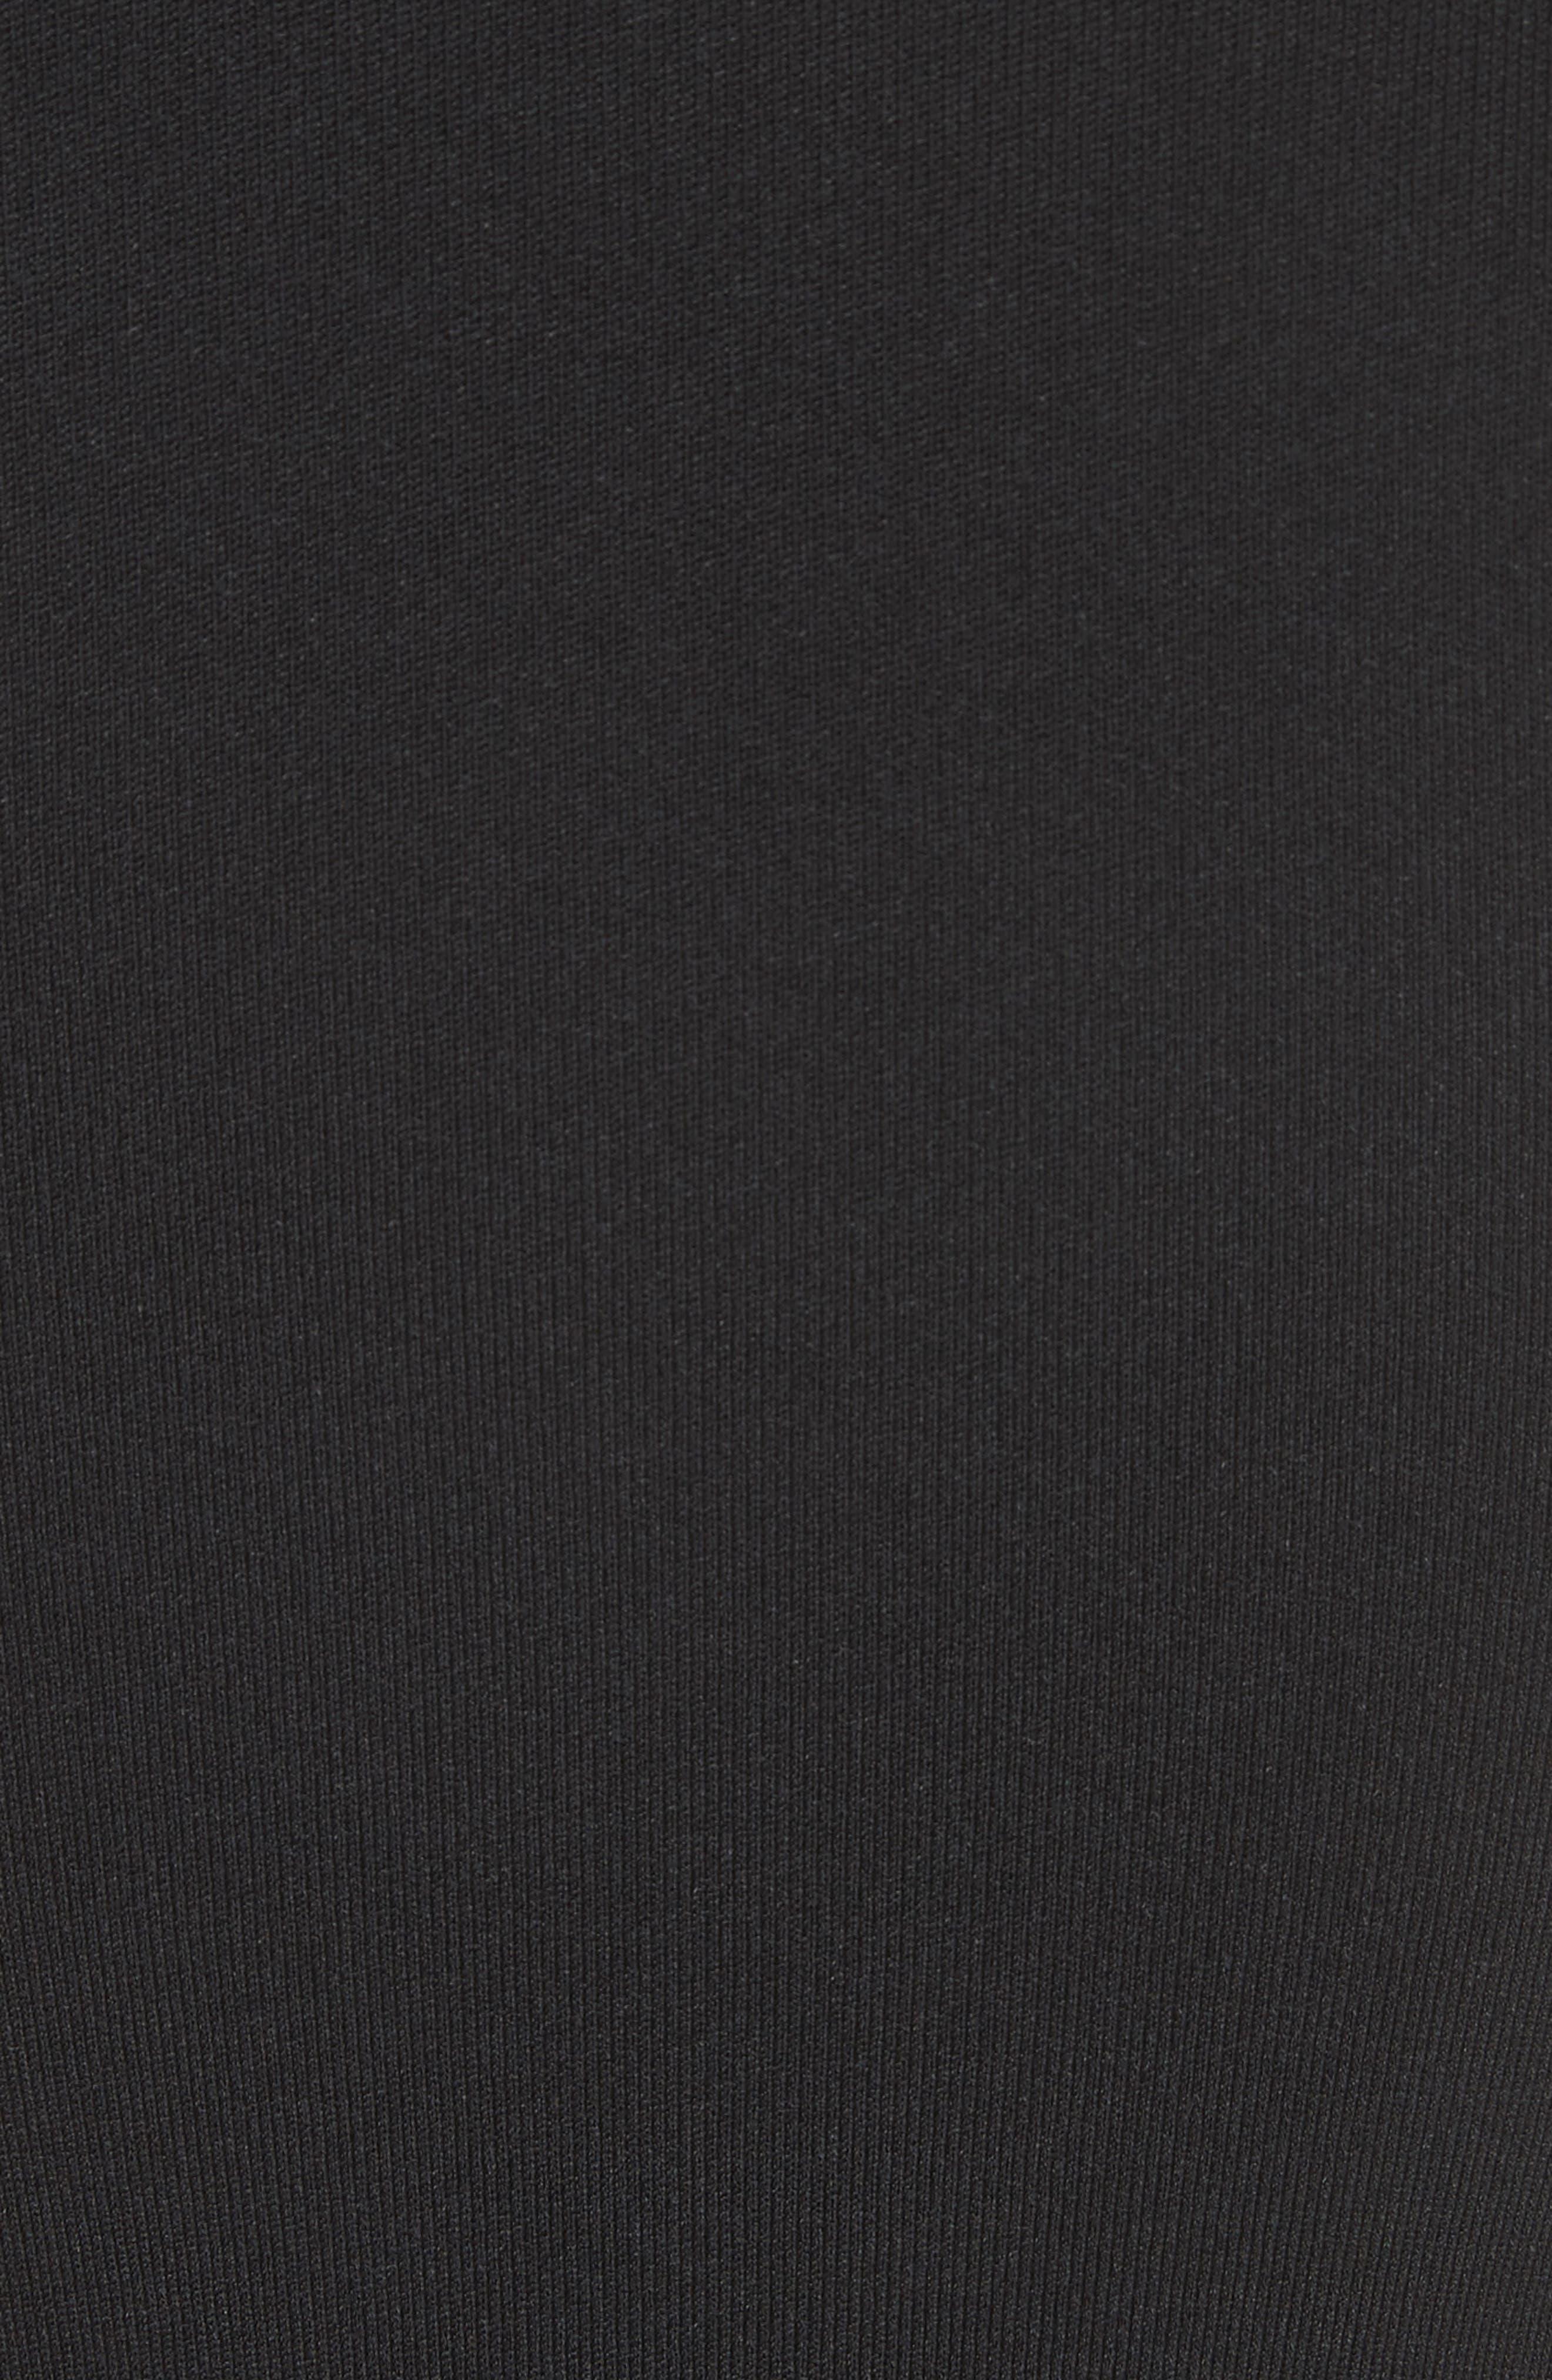 Open Knit Sleeve Dress,                             Alternate thumbnail 5, color,                             001